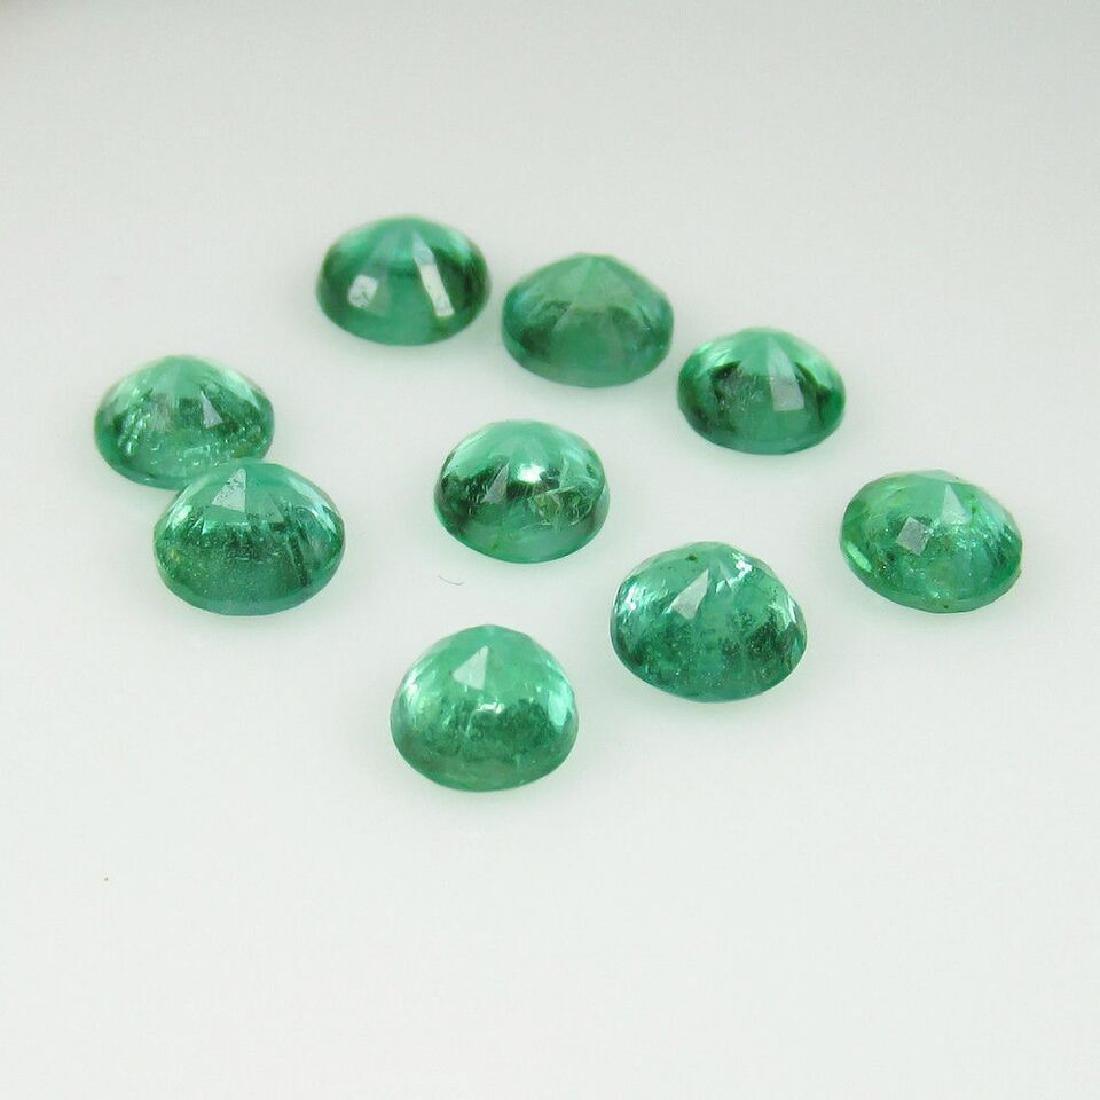 2.98 Carat 9 Loose Round Emeralds Necklace Set - 4